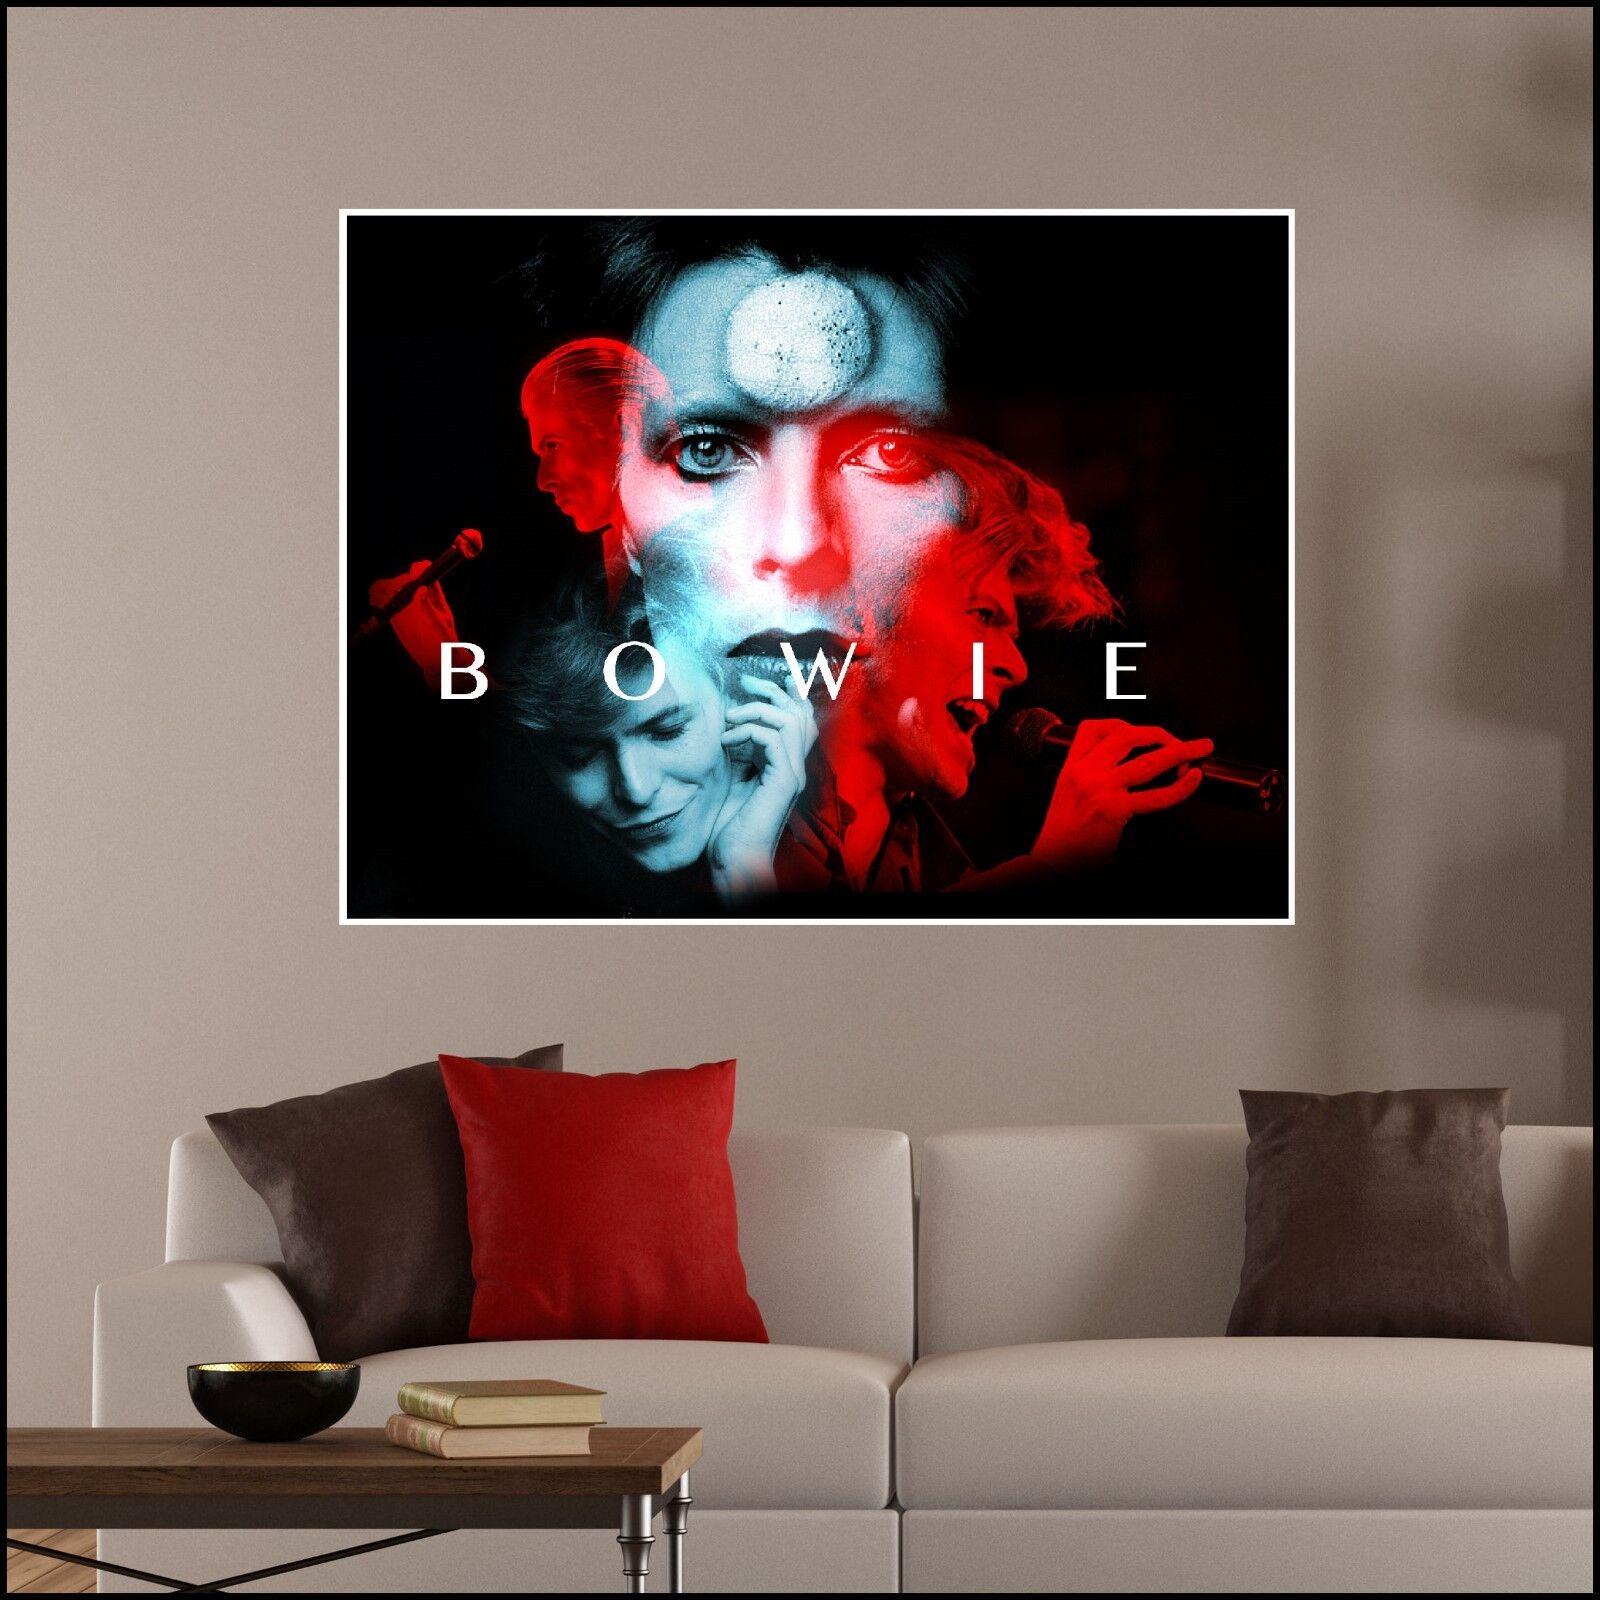 David Bowie Colour Photo vinyl wall art sticker 7 Größes A4 - XL 1.2m Mural